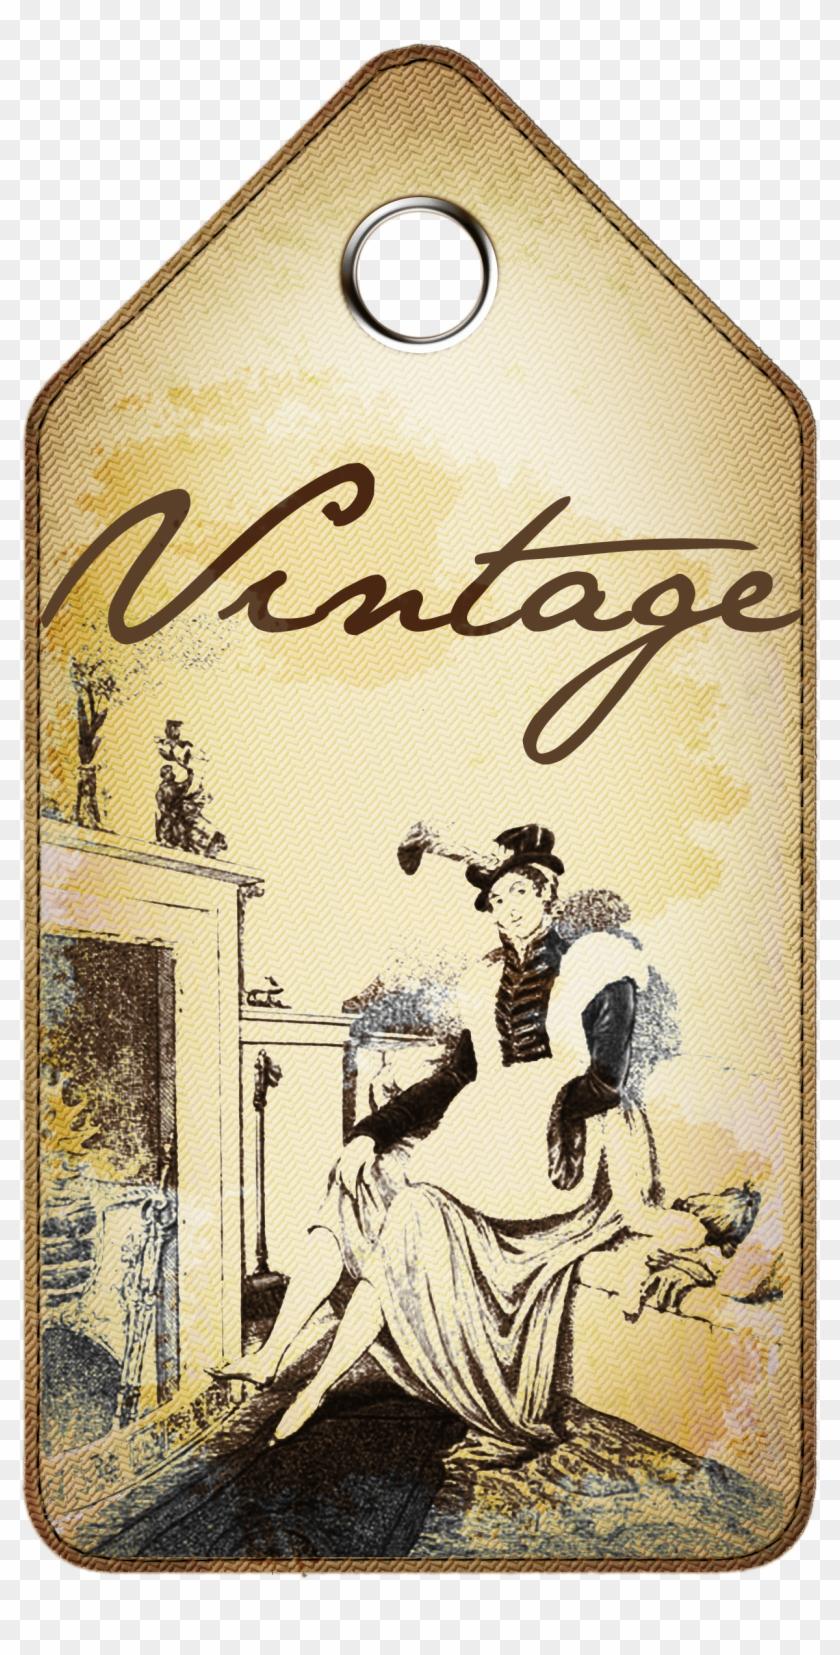 Vintage Tag - Vintage Paper Tag Tranparent #41445